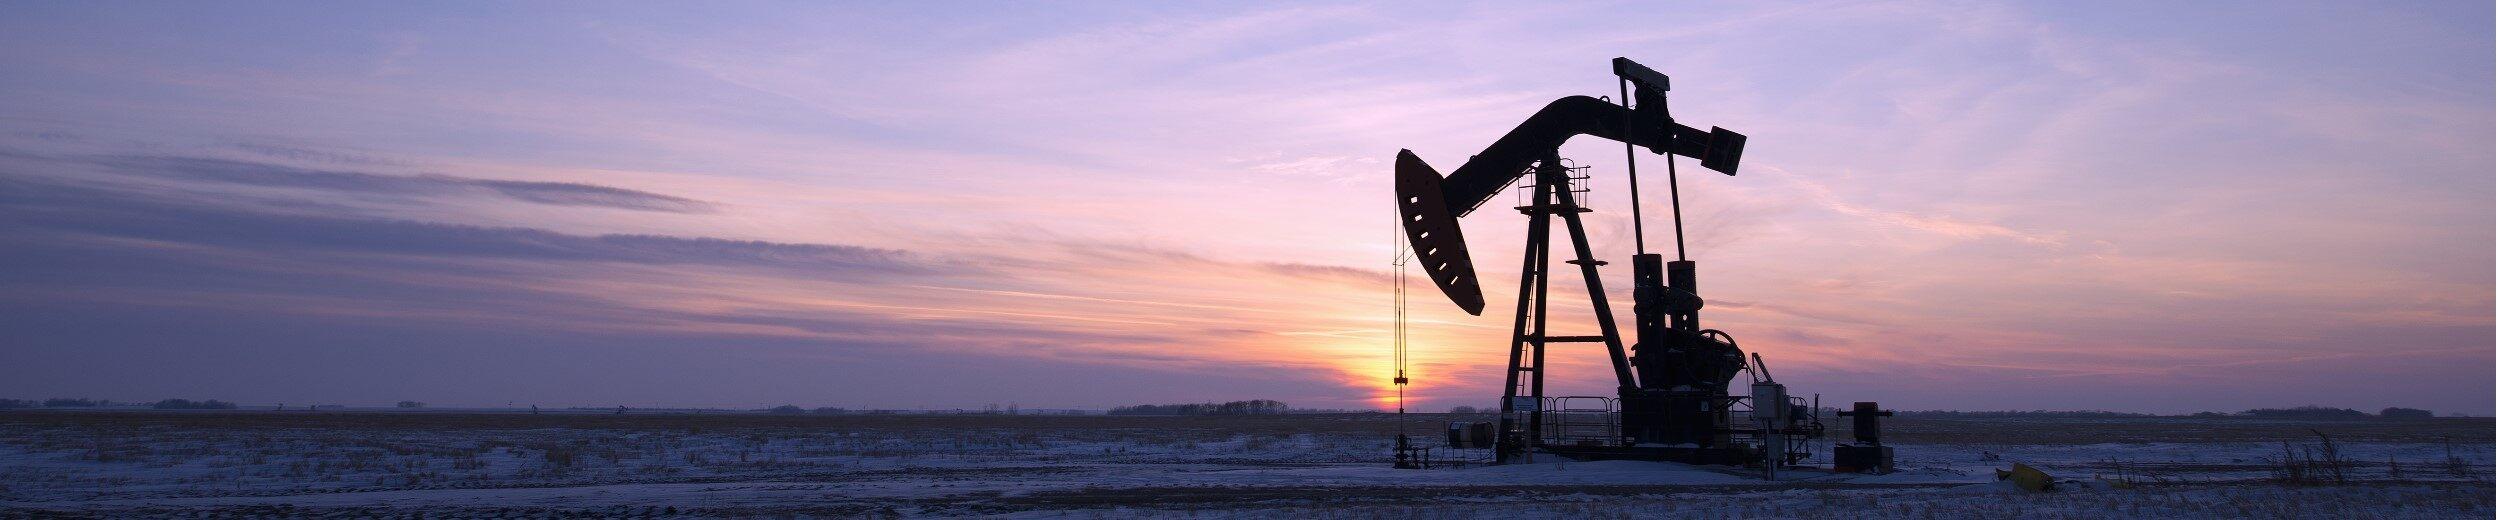 Ölpreis (Brent) – Tagesausblick 03.06.20